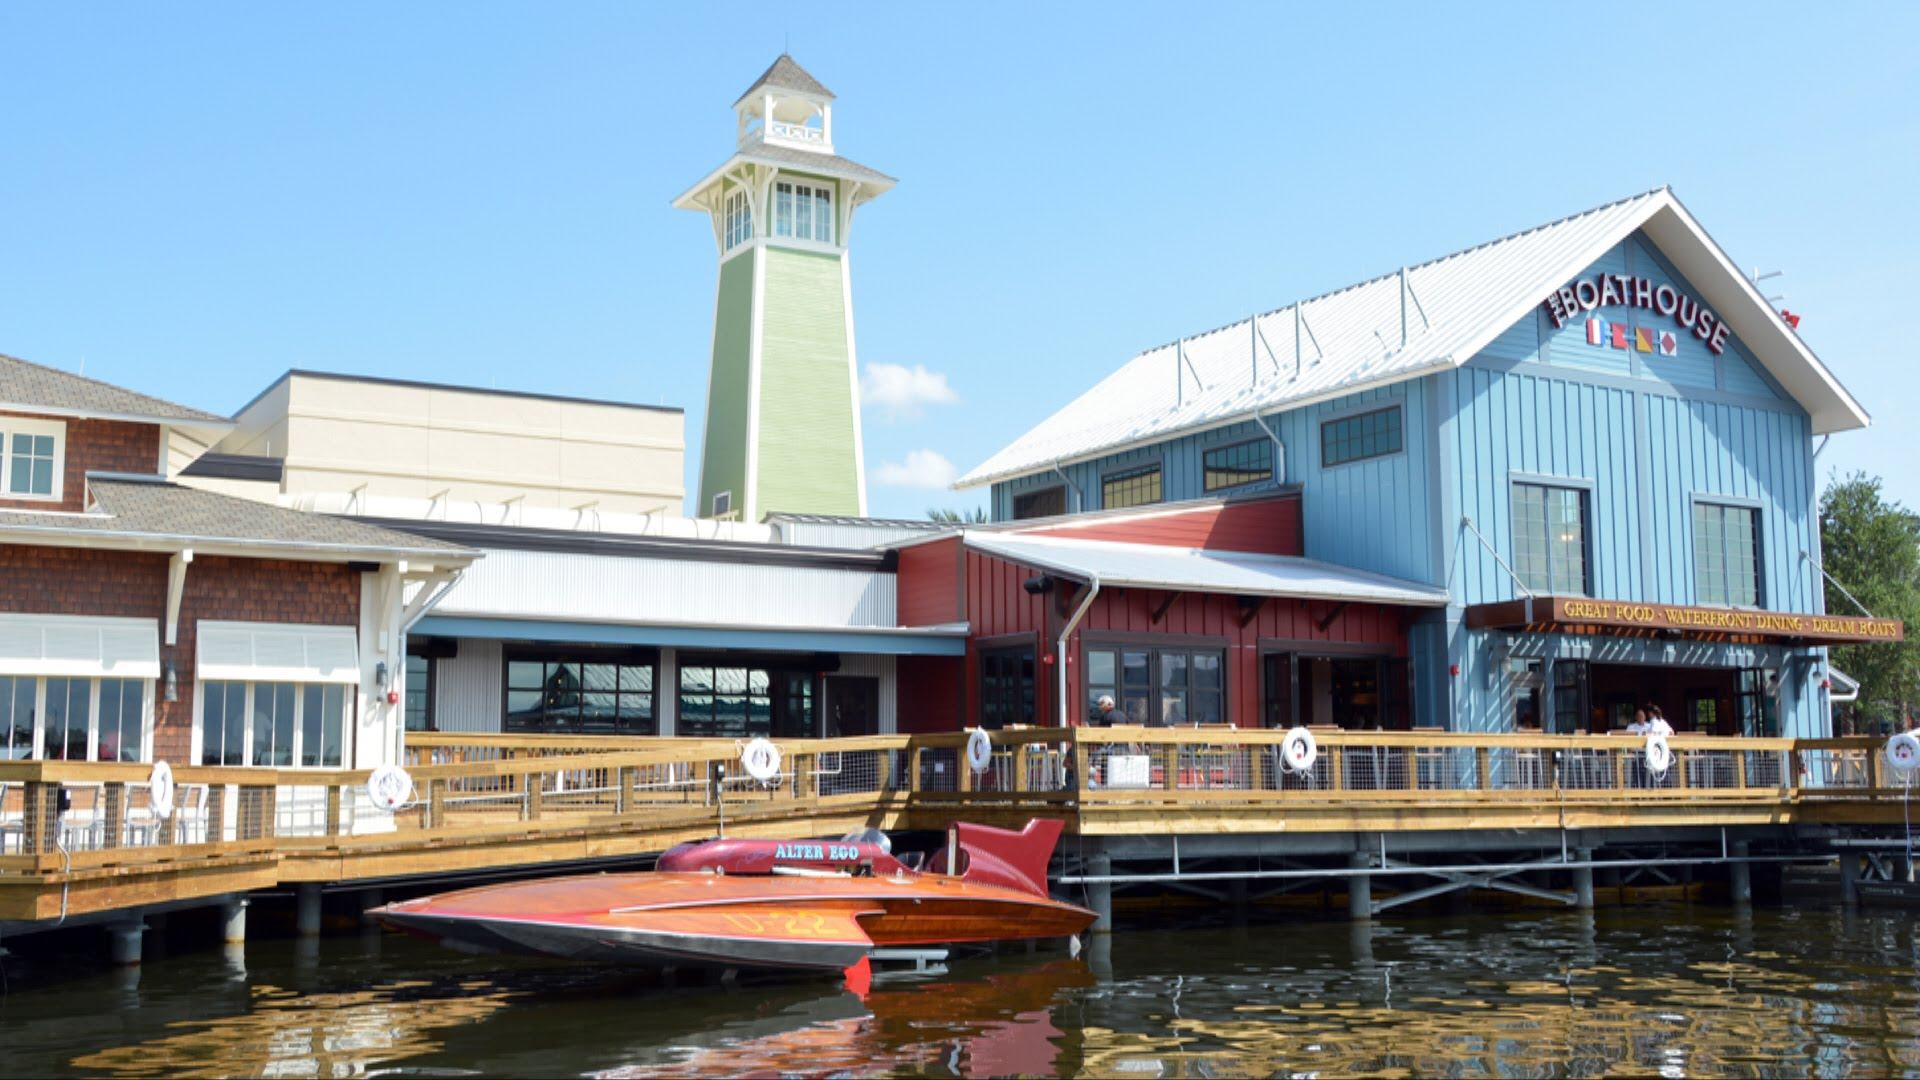 BoatHouse Disney Springs